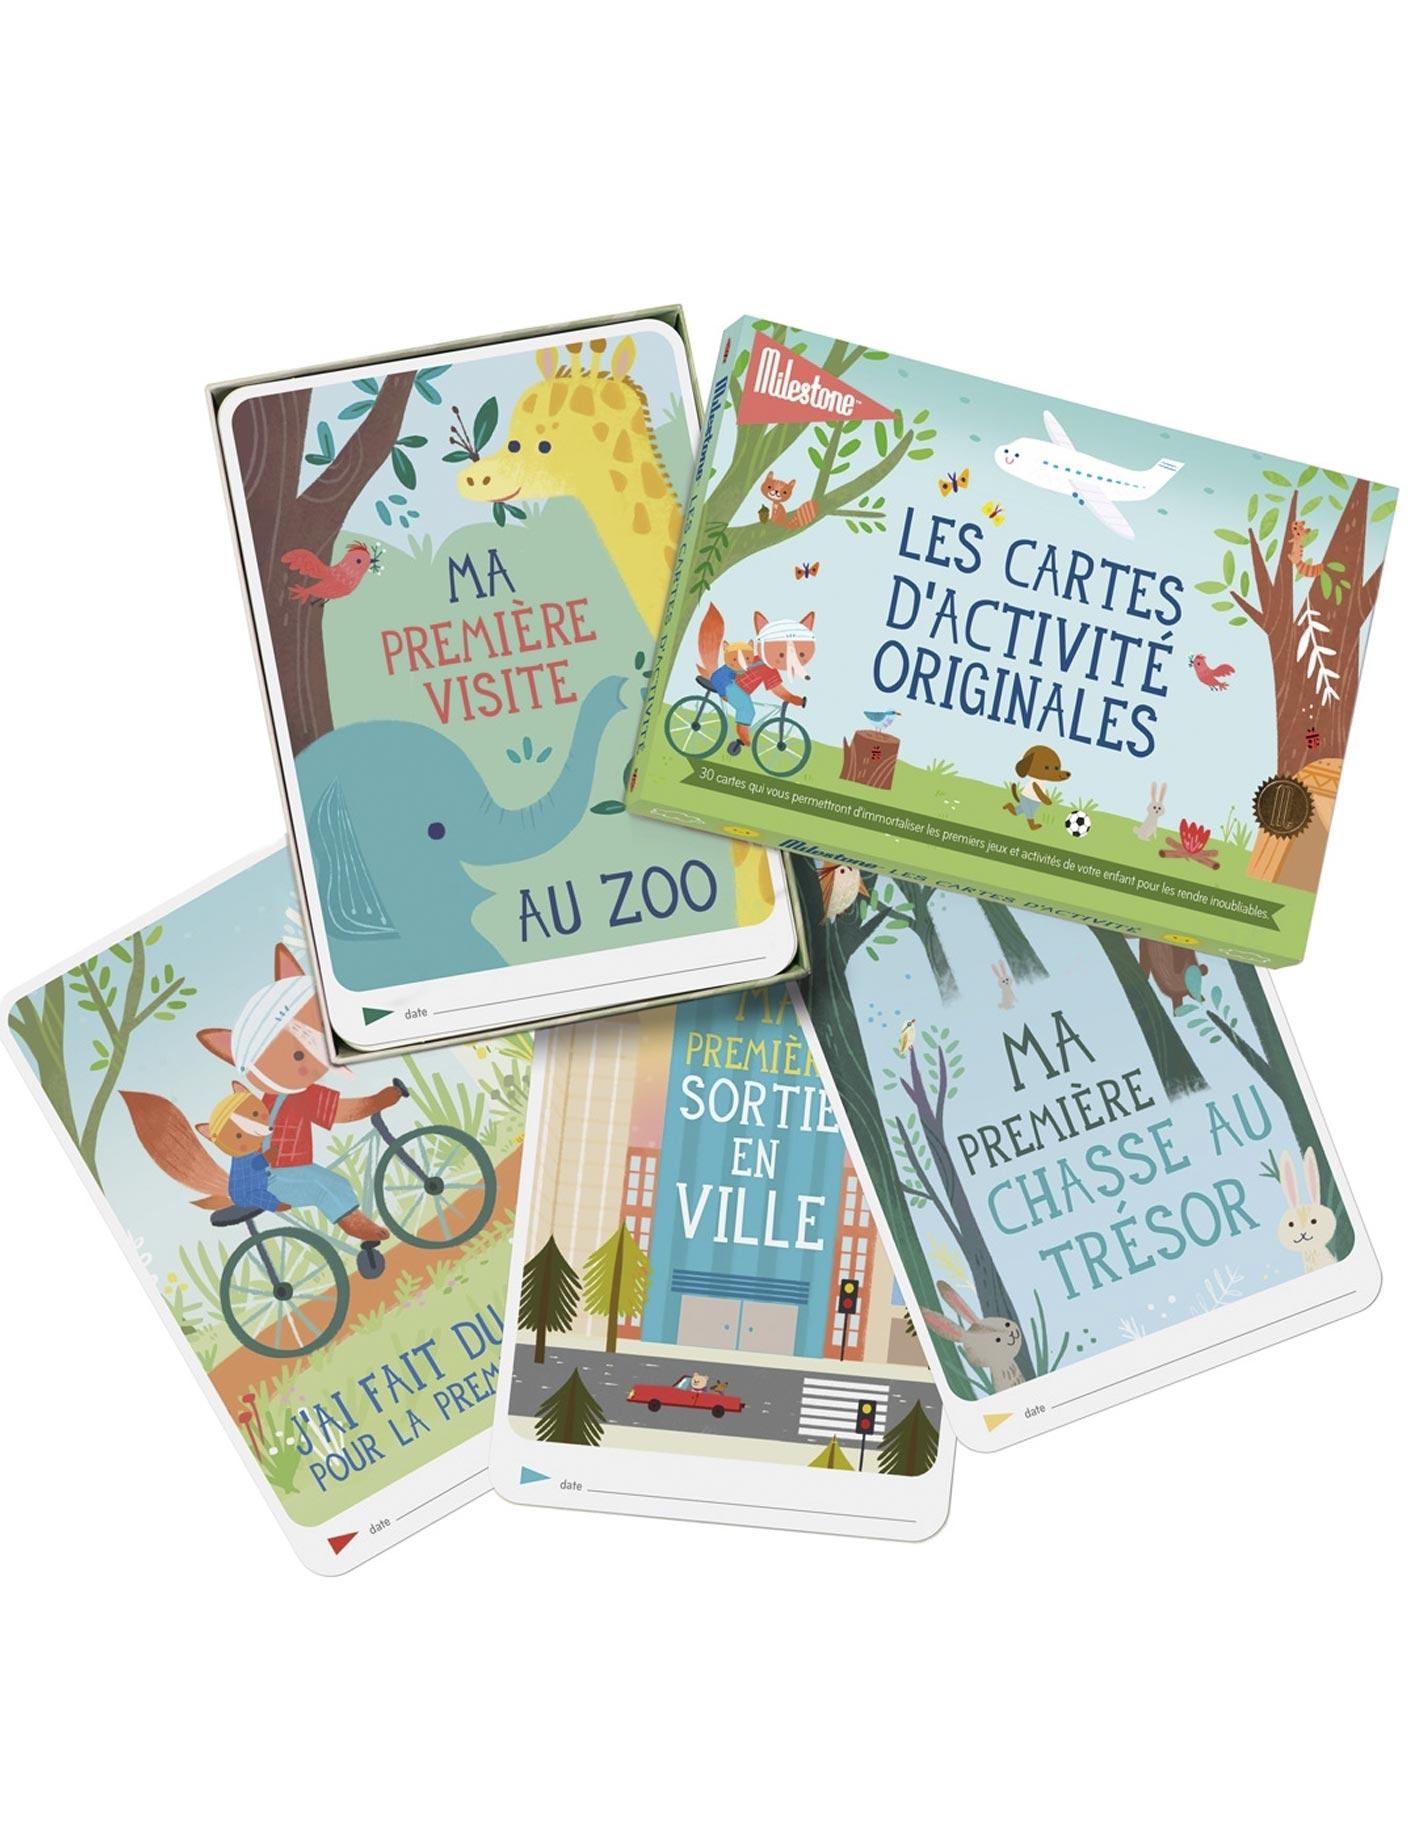 Cartes Photos Souvenirs Des Activite Originales Milestone